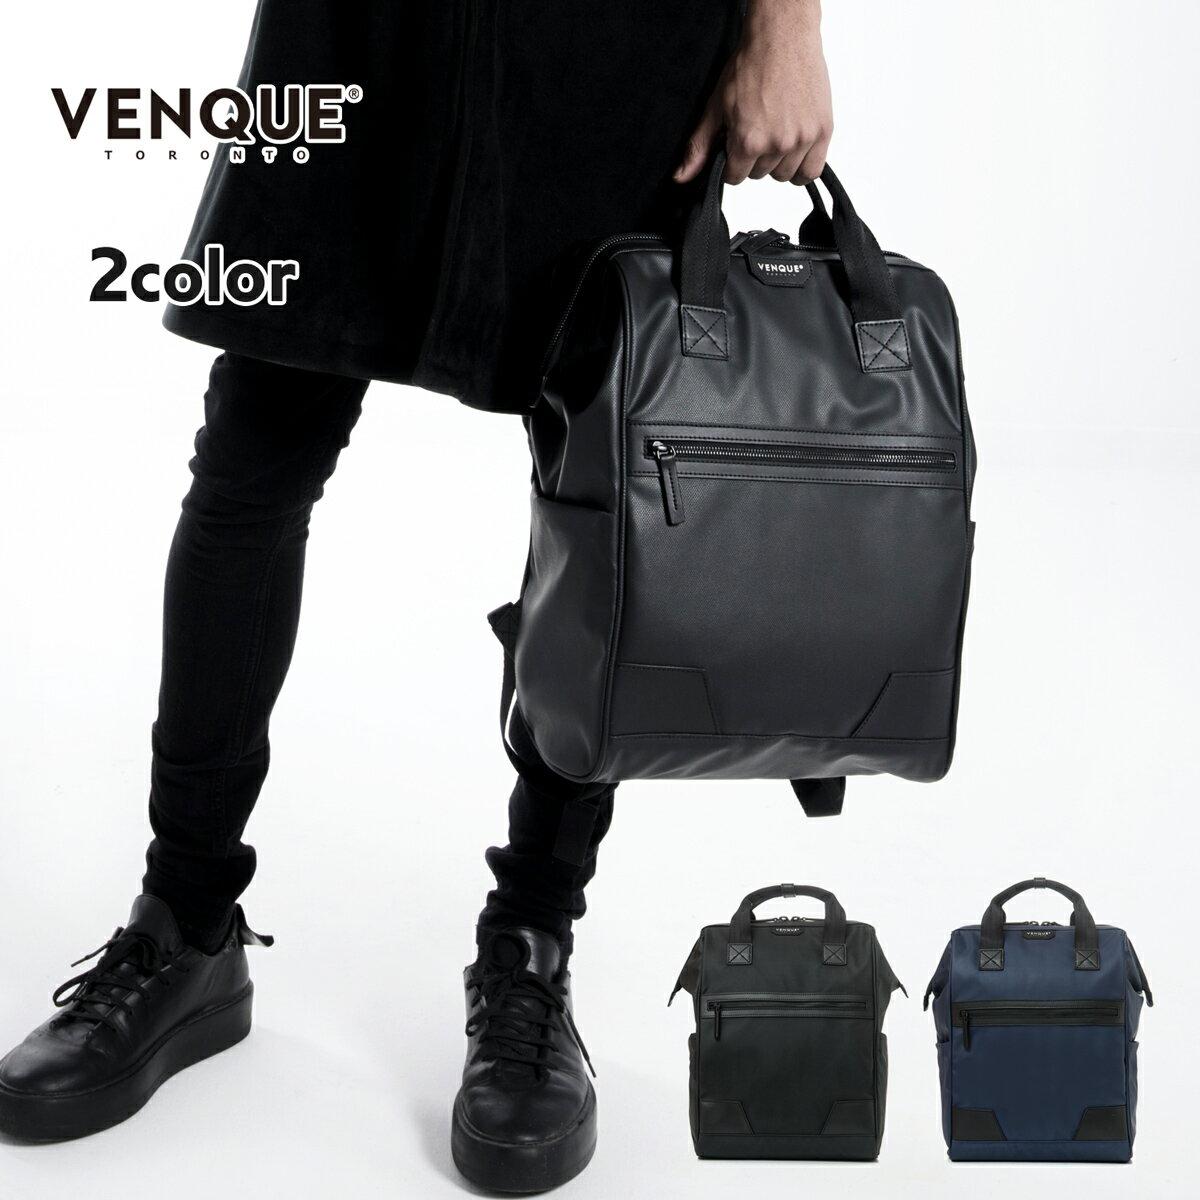 VENQUE ヴェンク AIRLIGHT バックパック メンズ/レディース ブラック/ブルー OS